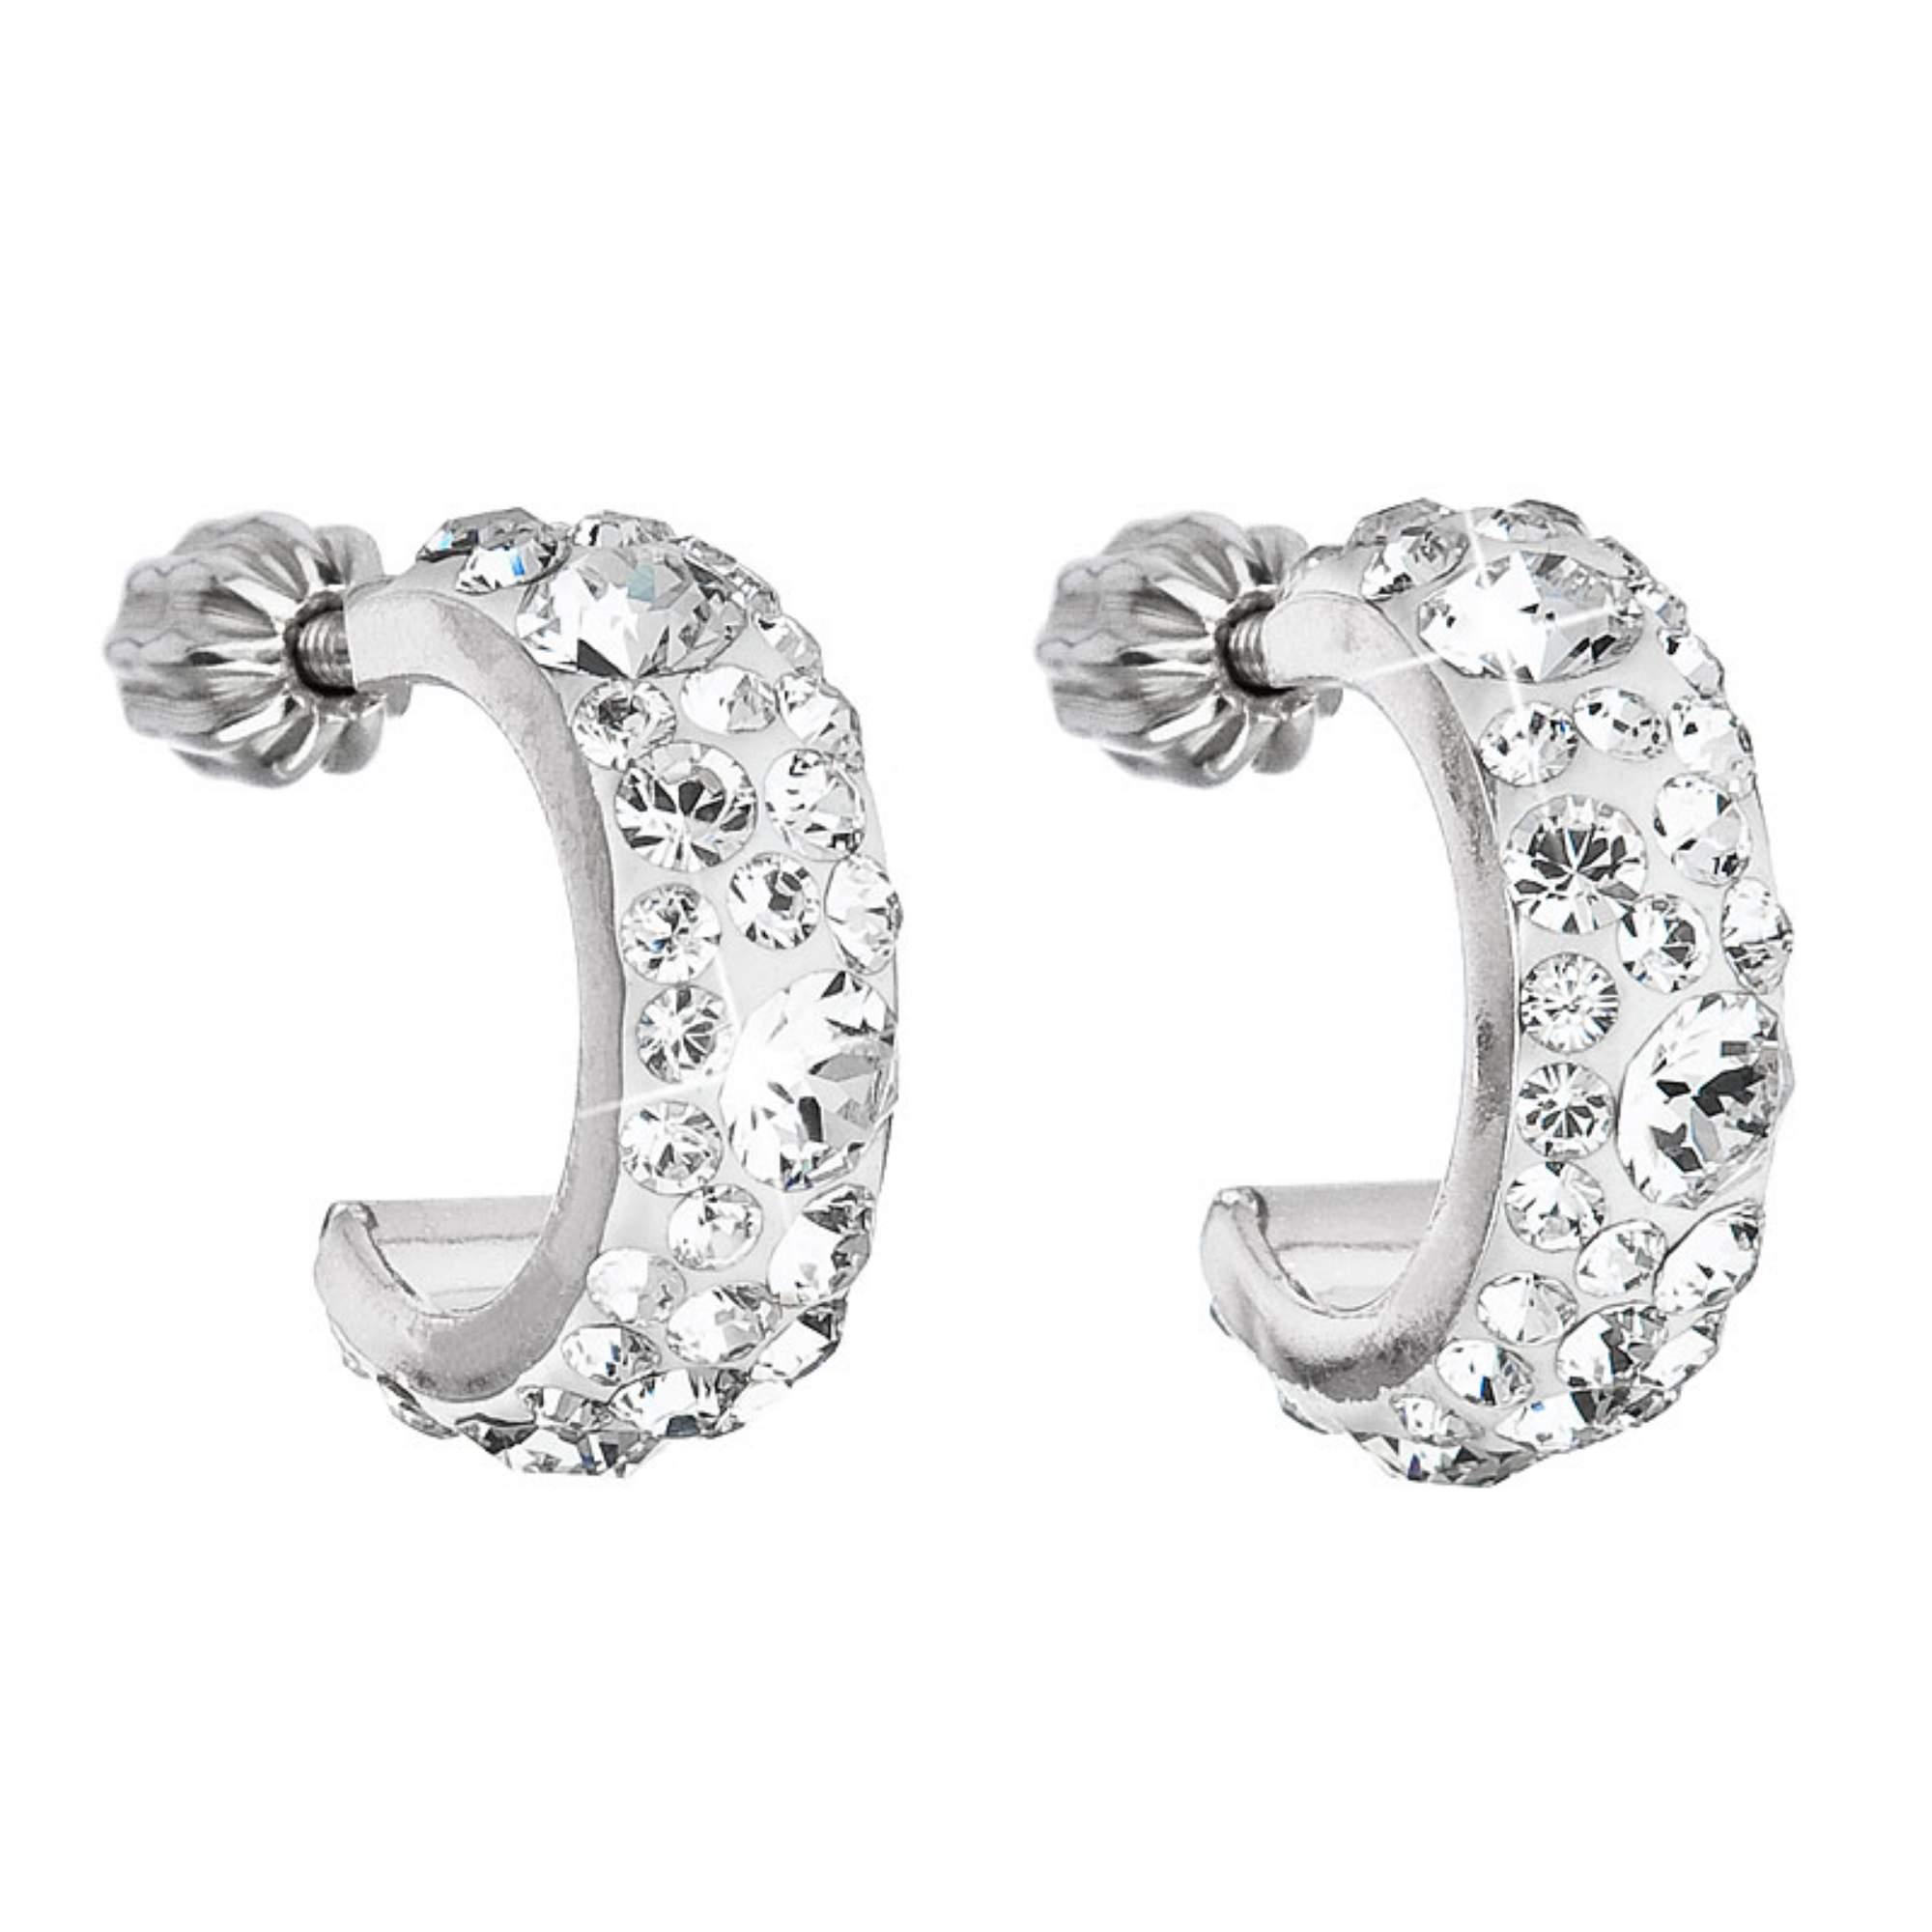 Stříbrné náušnice kruhy s krystaly Crystals from Swarovski® Crystal EG2031-CR